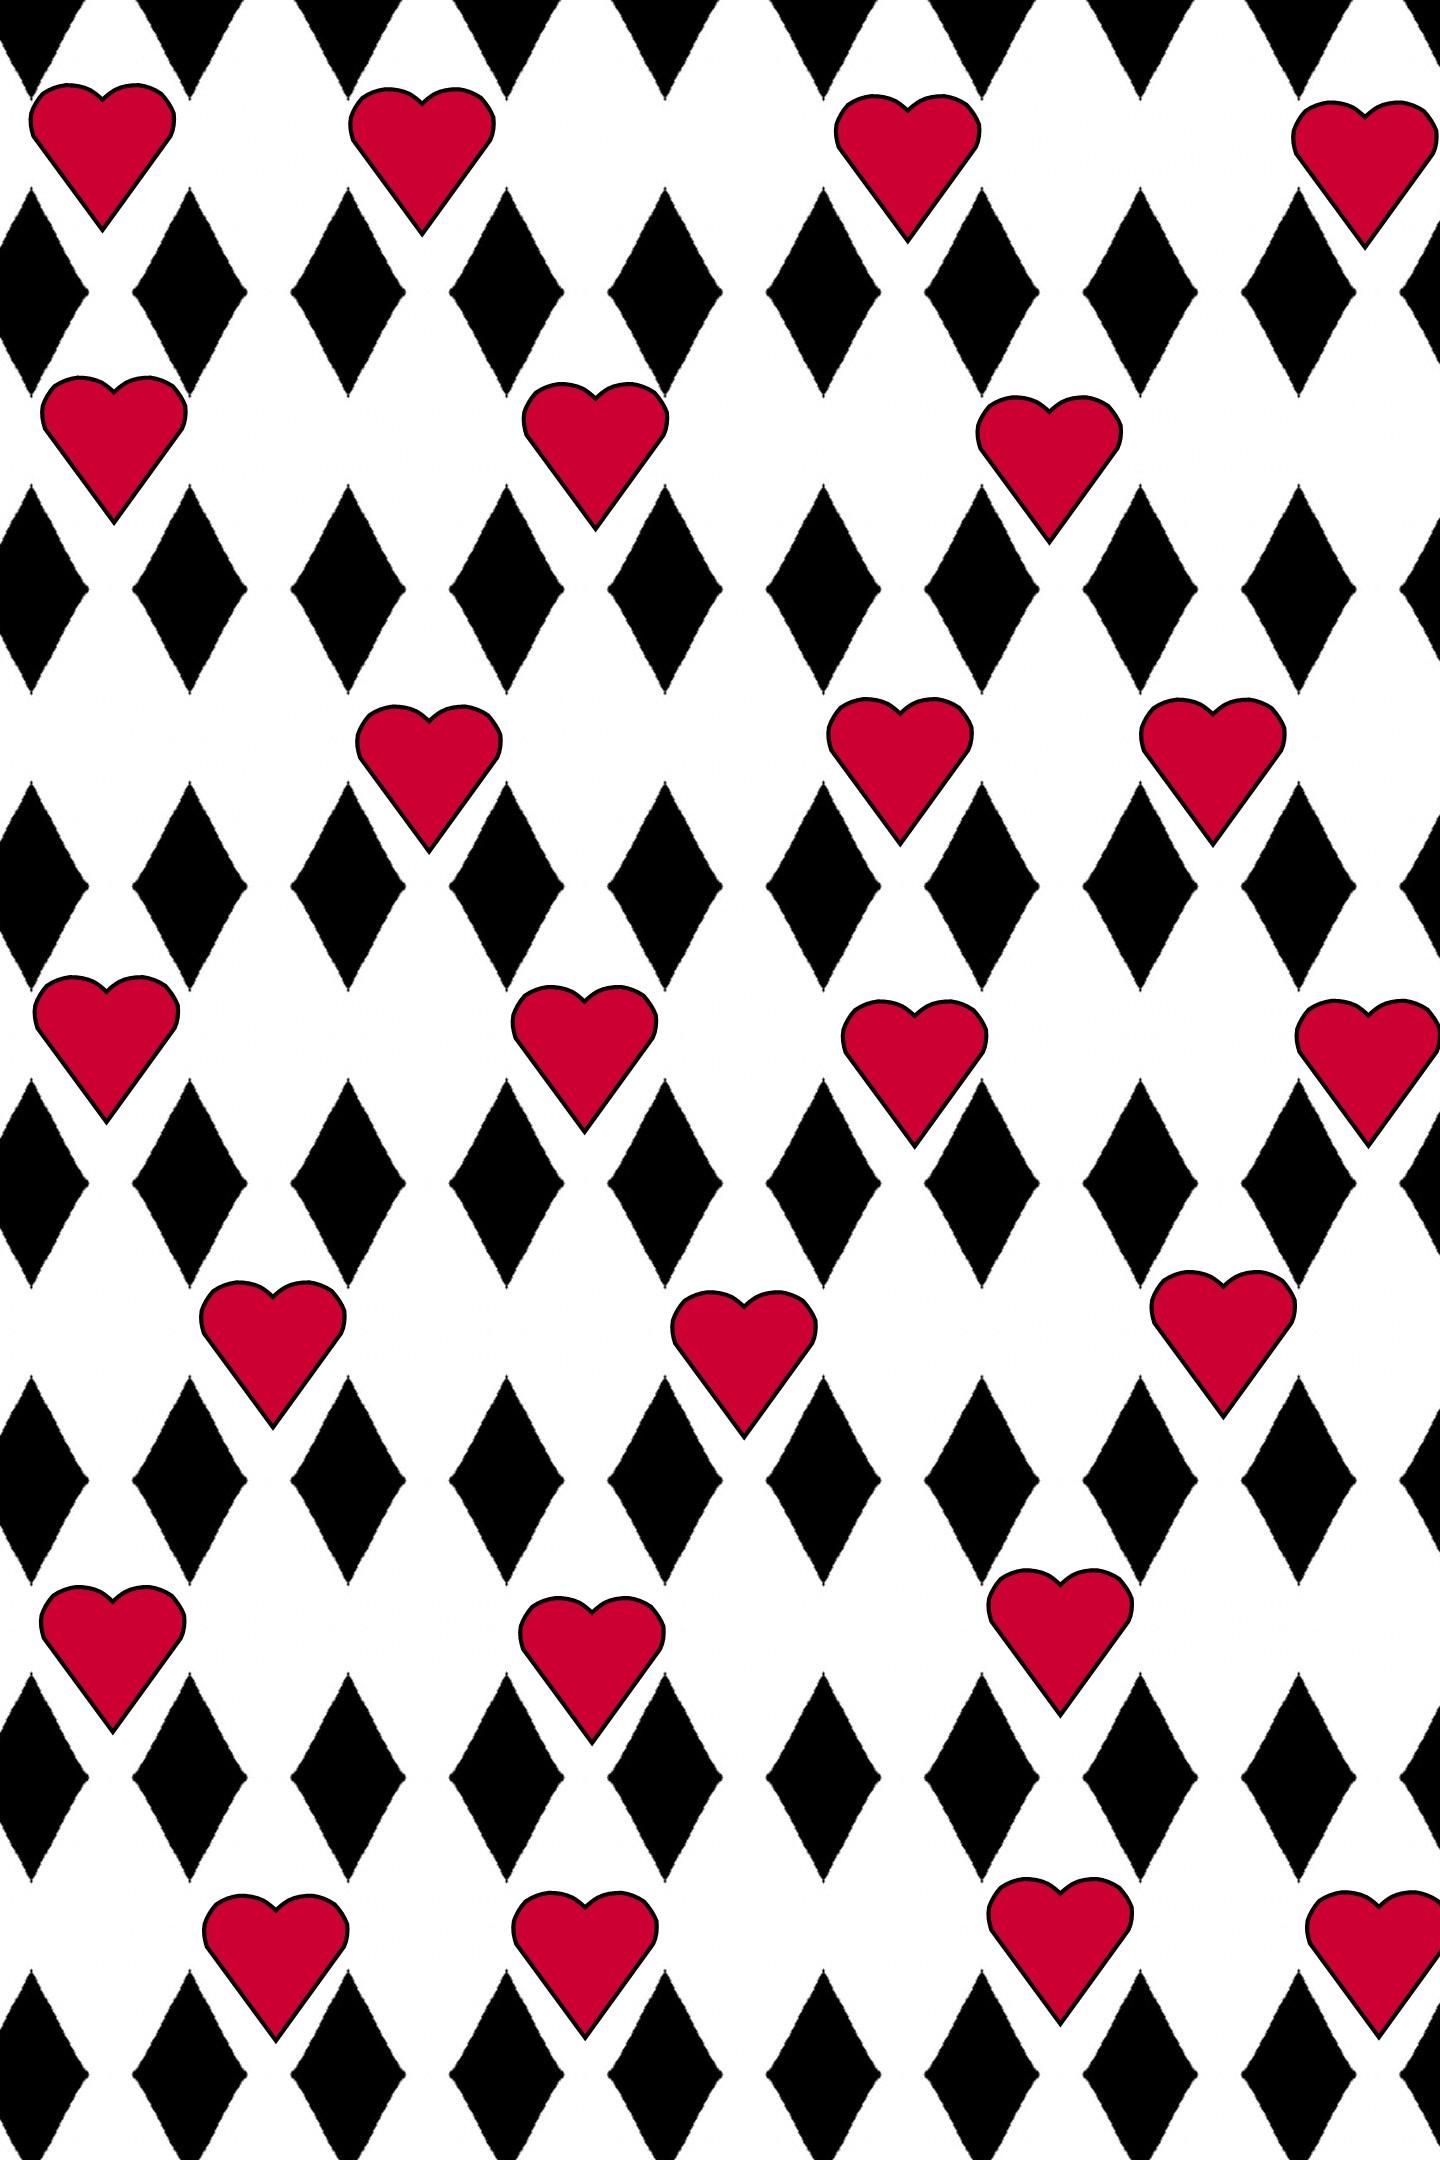 file 1183 diamonds and hearts jpg wikimedia commons